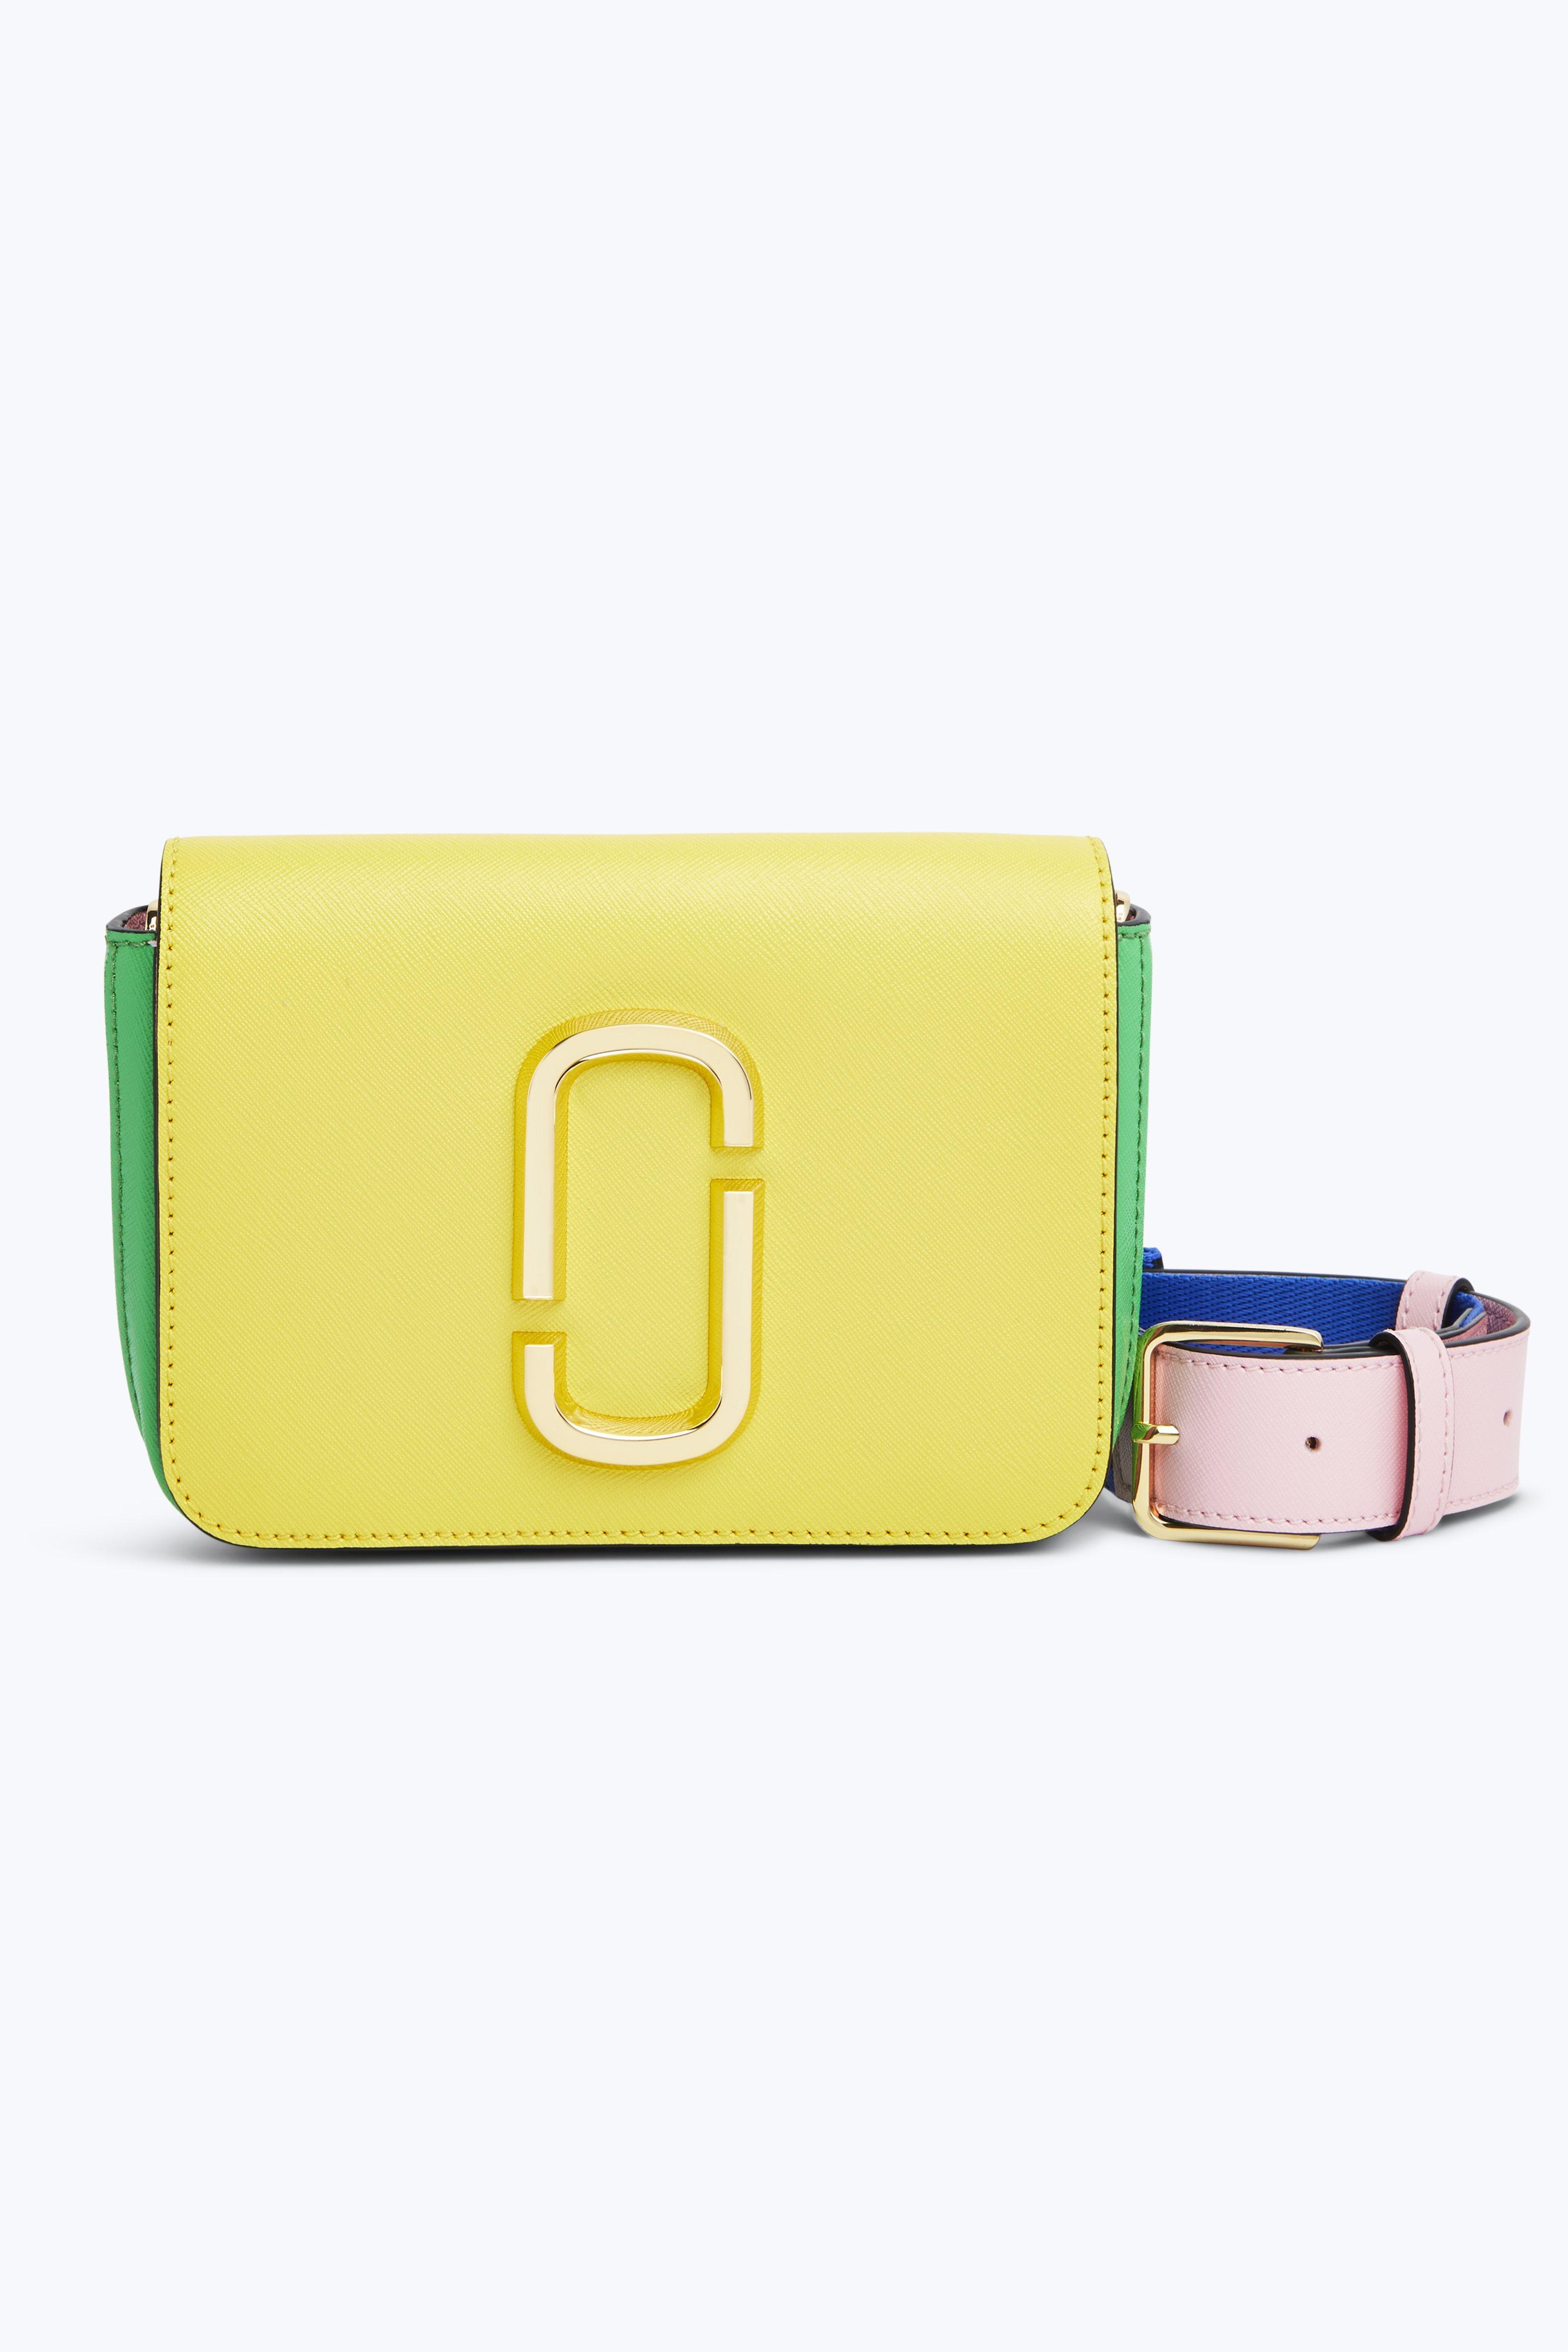 Saffiano Leather Hip Shot Convertible Shoulder/Belt Bag, Daisy Yellow Multi